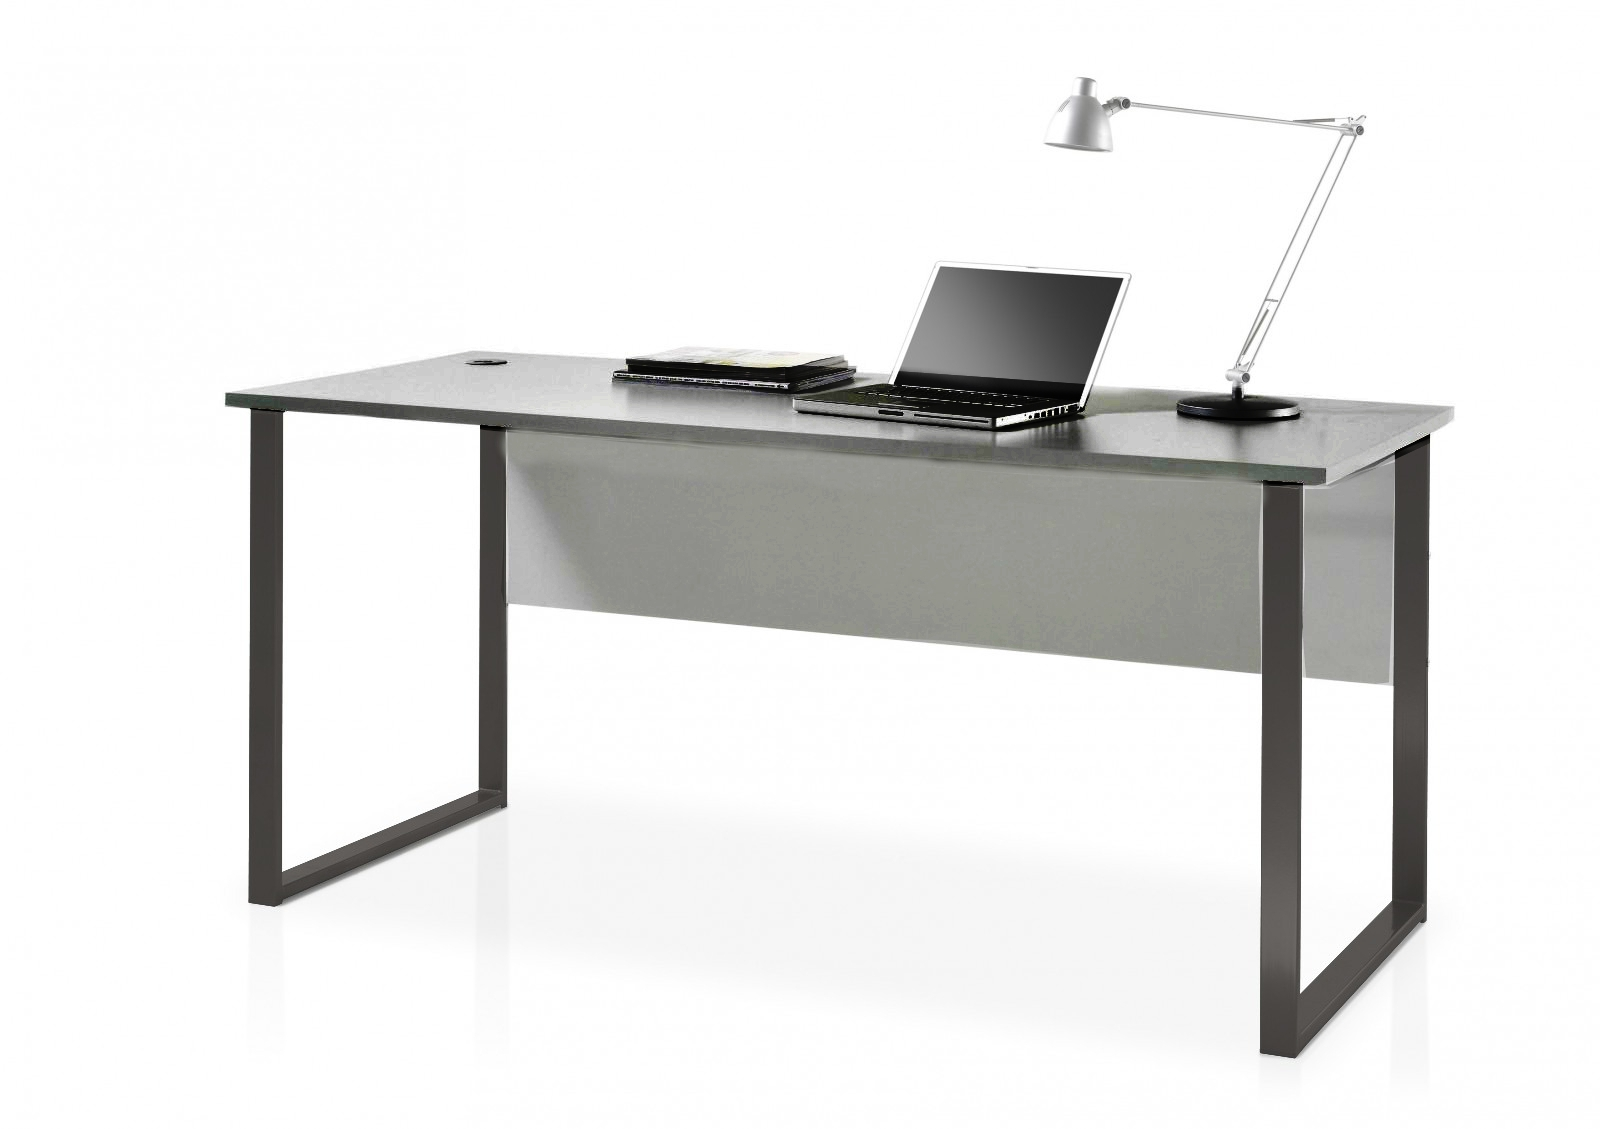 Masa de birou din pal si metal, Luxury Gri / Grafit, L170xl73xH76 cm somproduct.ro